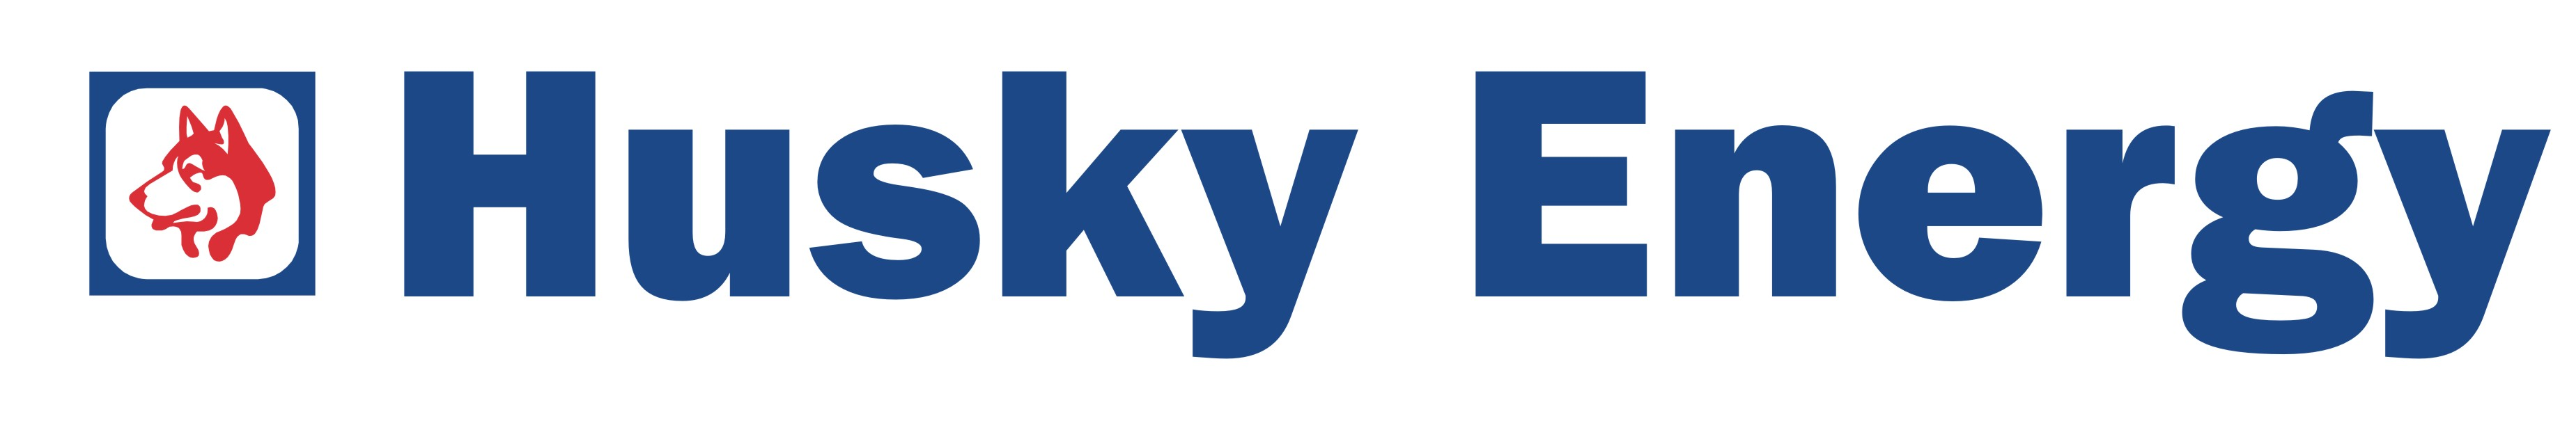 Husky Energy logo.jpg